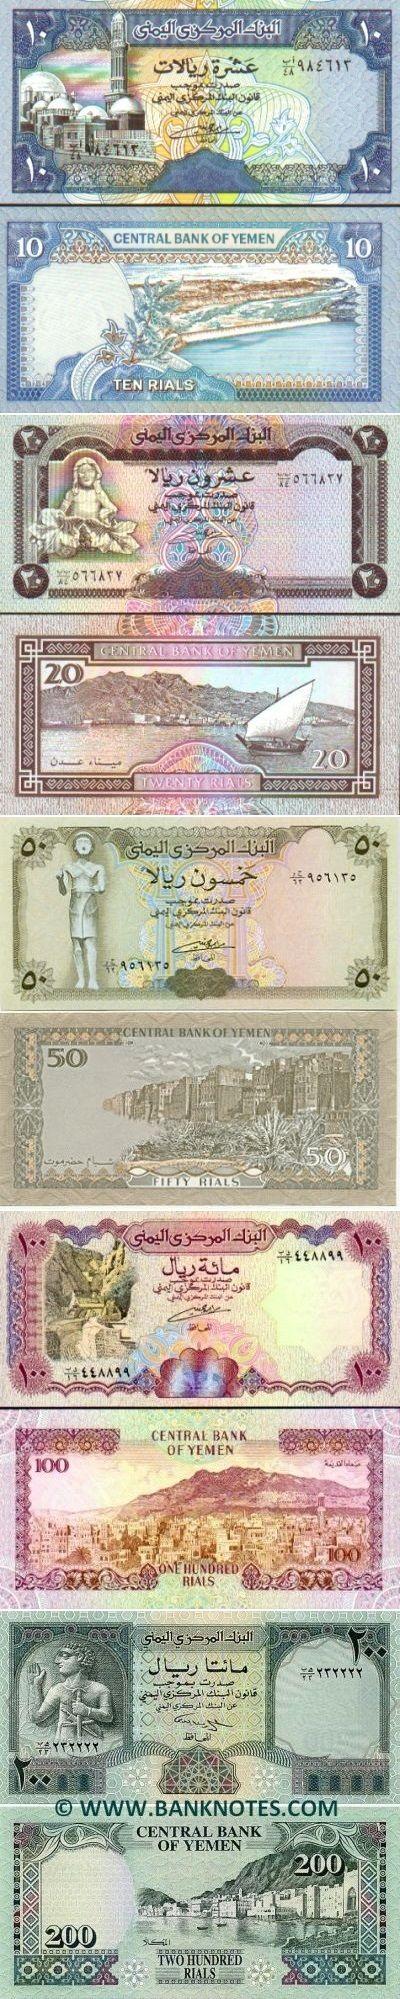 Yemen Arab Republic: 10 Rials ND(1990-), 20 Rials ND(1995), 50 Rials ND(ca.1993), 100 Rials ND(1993), 200 Rials ND(1996).